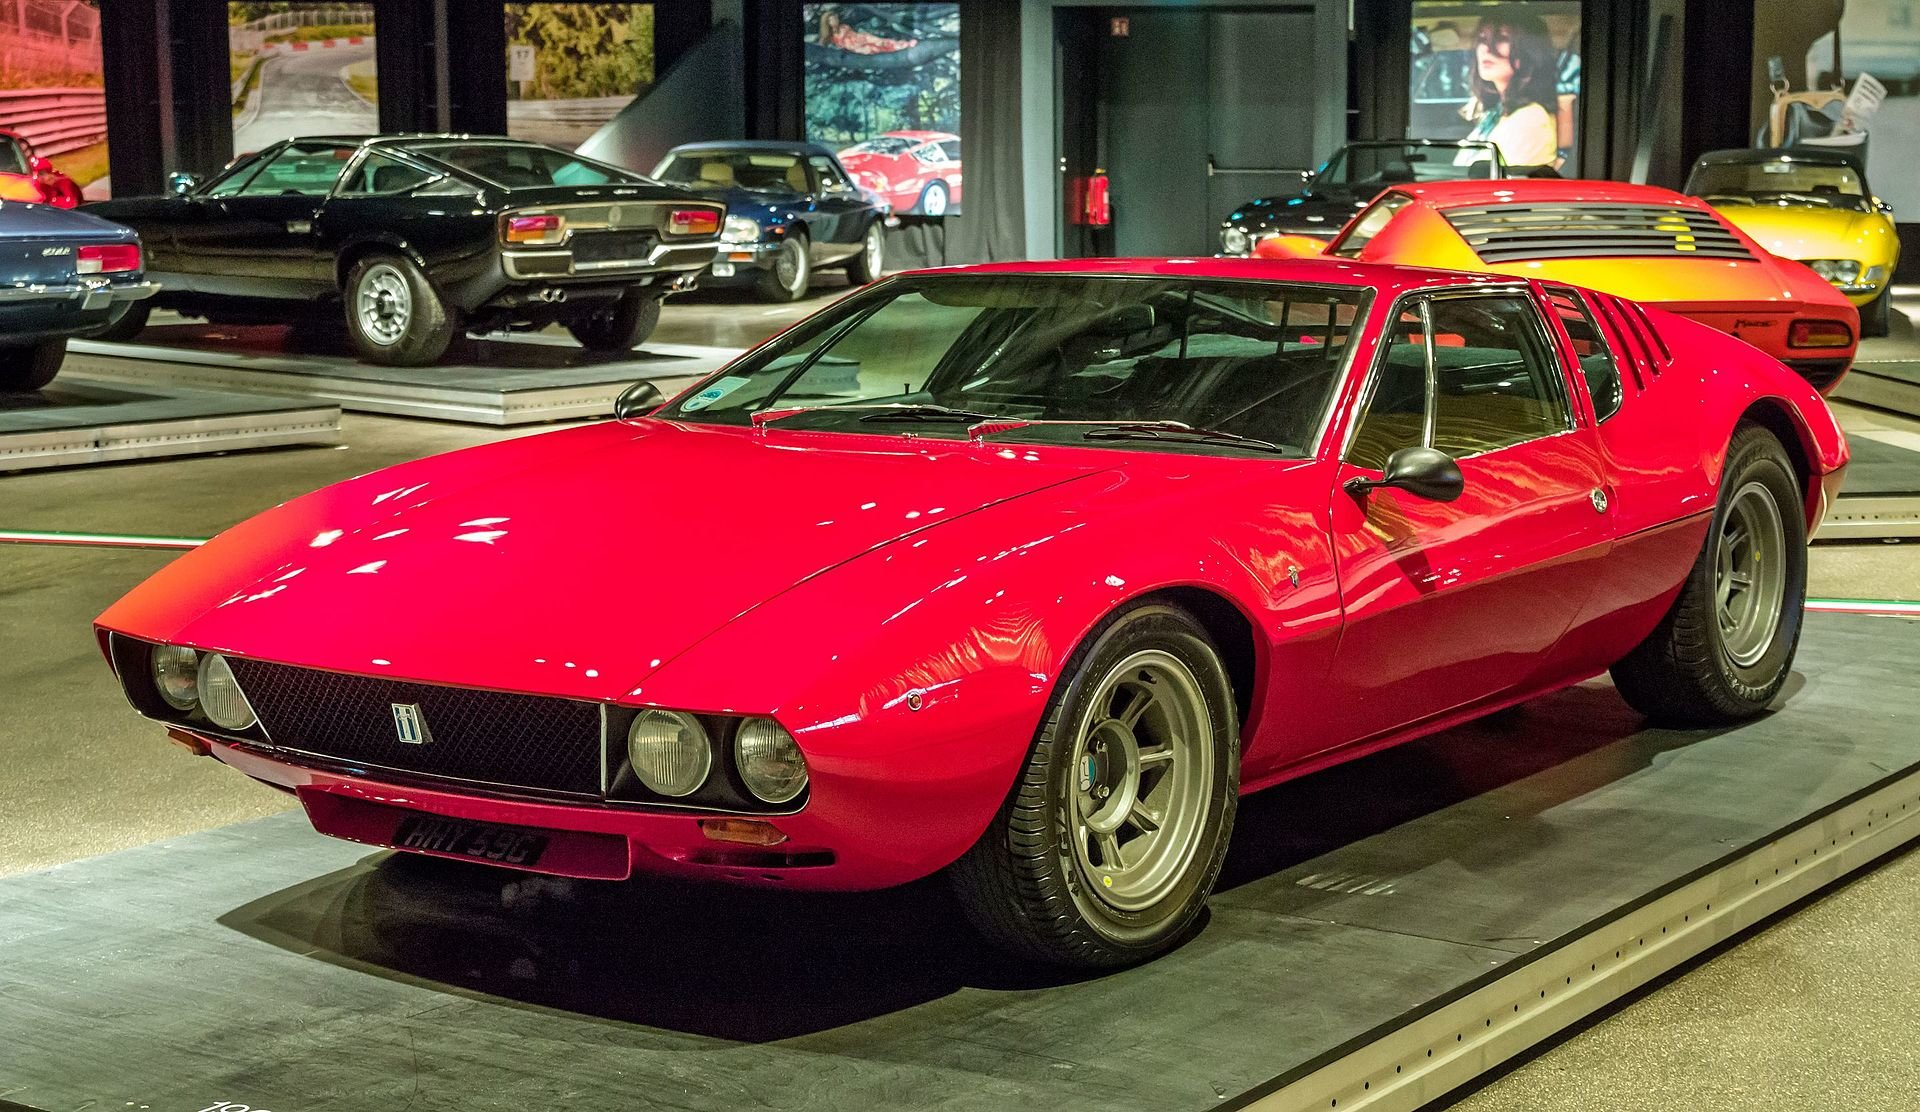 1971 De Tomaso Mangusta For Sale (picture 1 of 2)